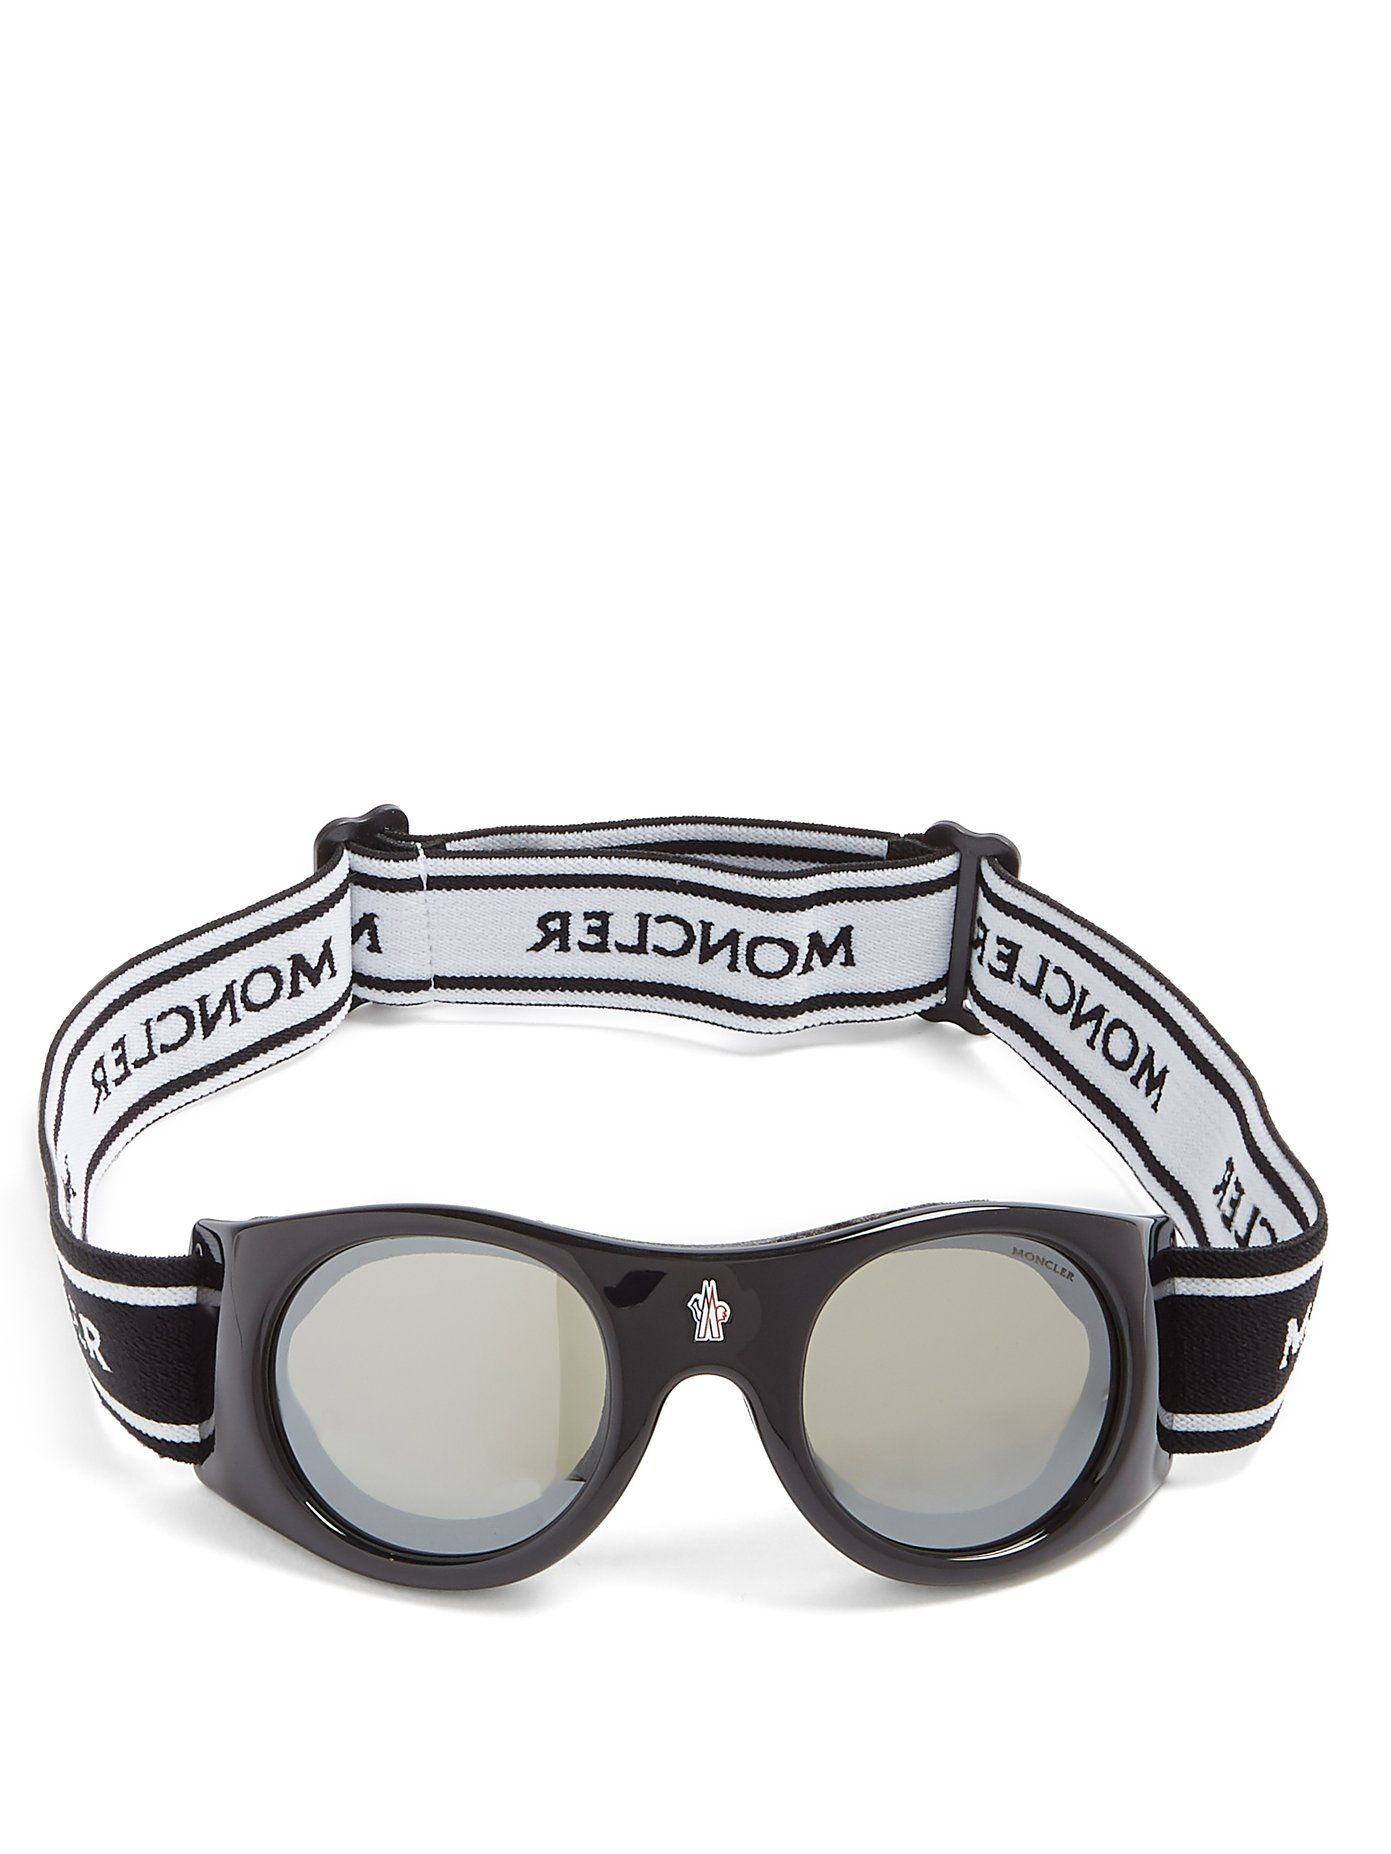 14a3a85f627 Moncler Round-frame ski goggles